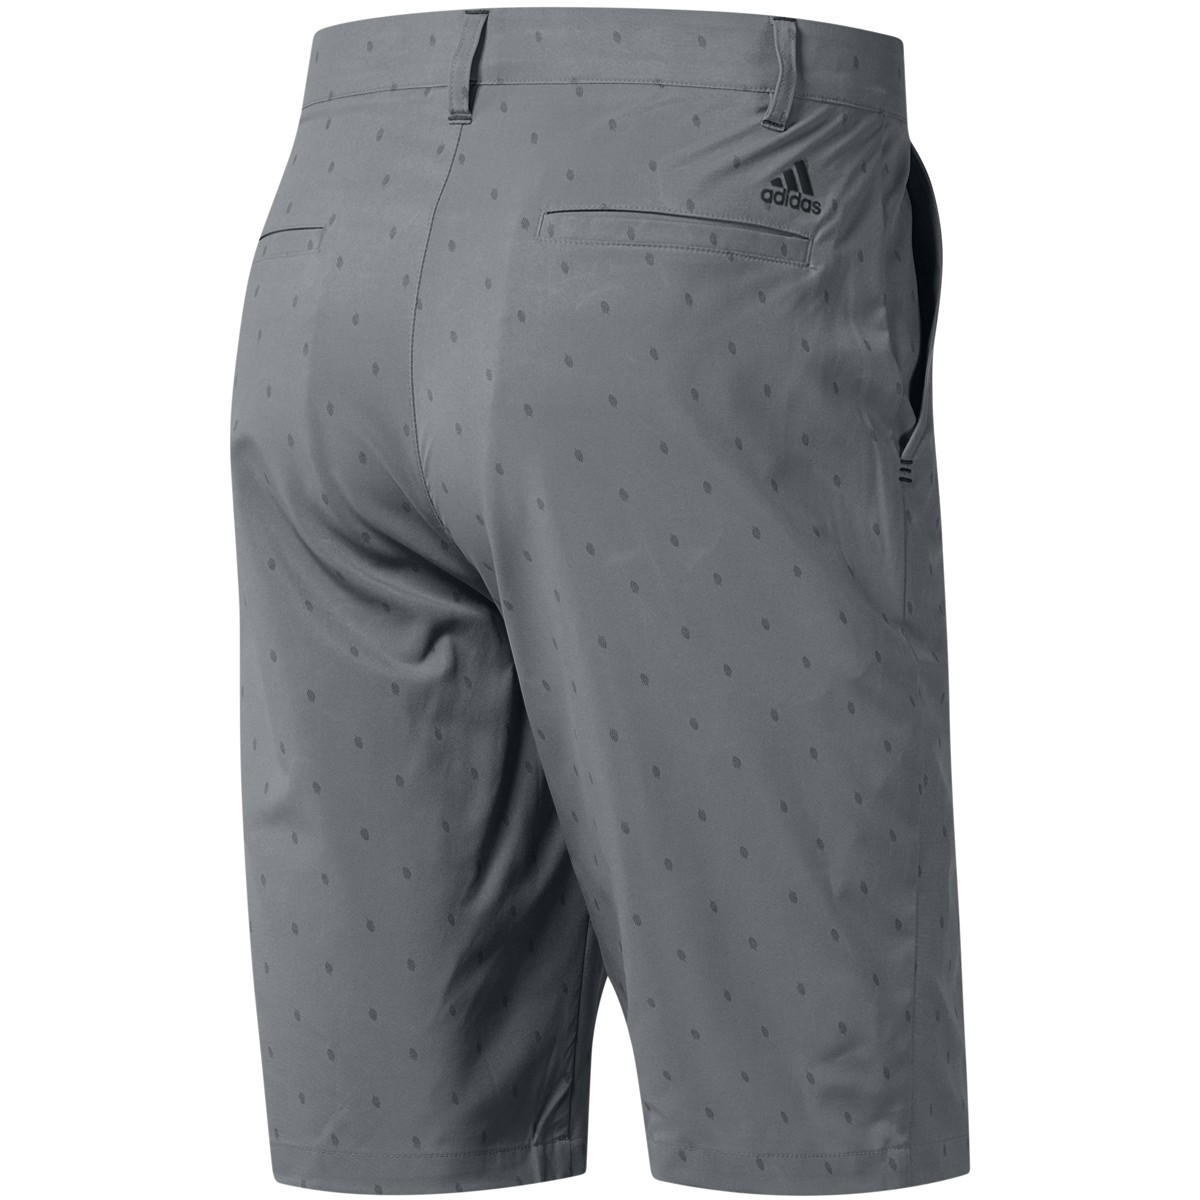 Adidas-Golf-Men-039-s-Ultimate-Print-Shorts-Choose-Size-amp-Color thumbnail 6